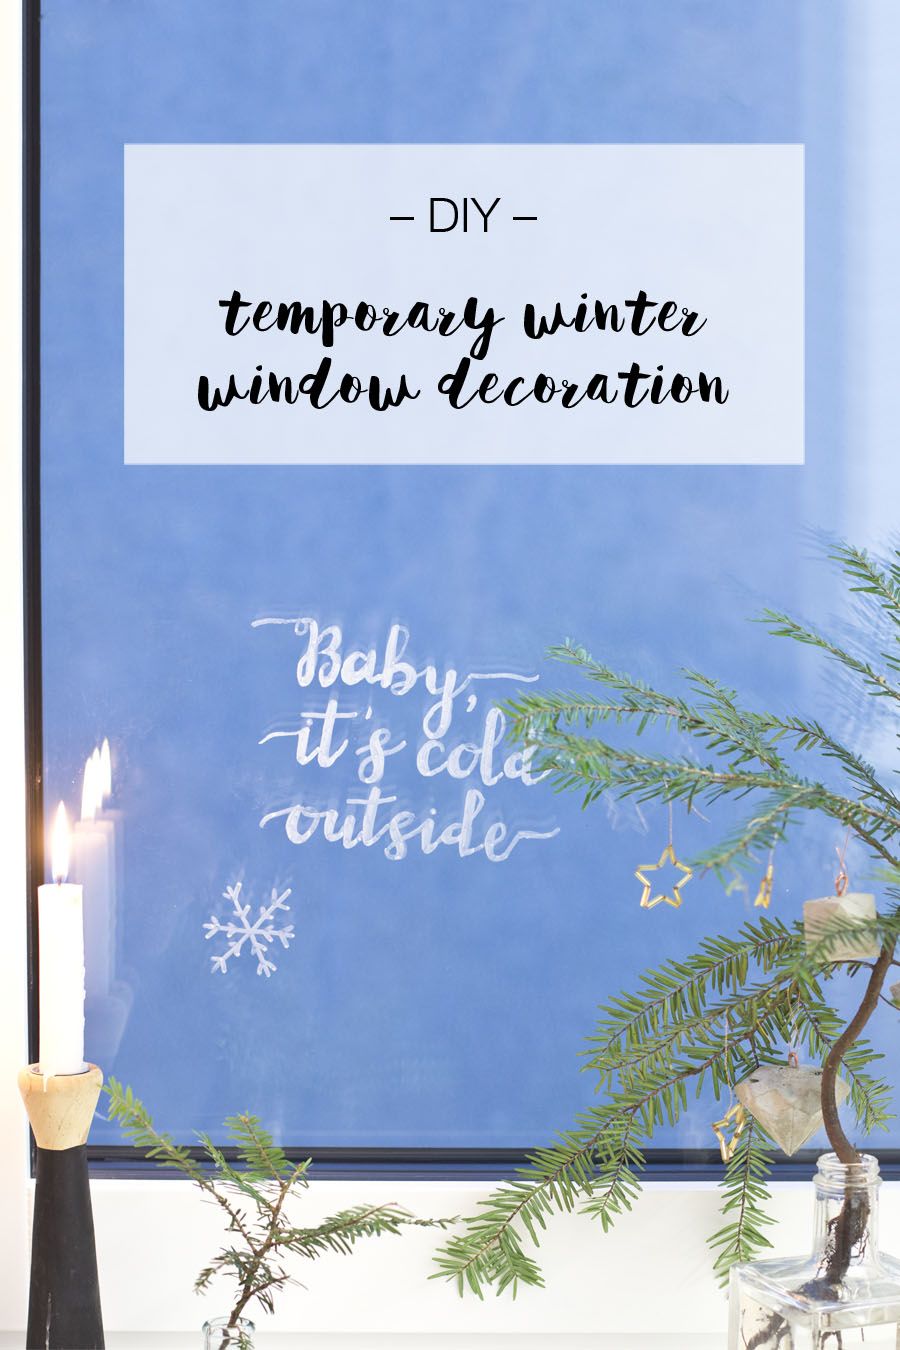 Temporary winter window decoration   LOOK WHA TI MADE ...